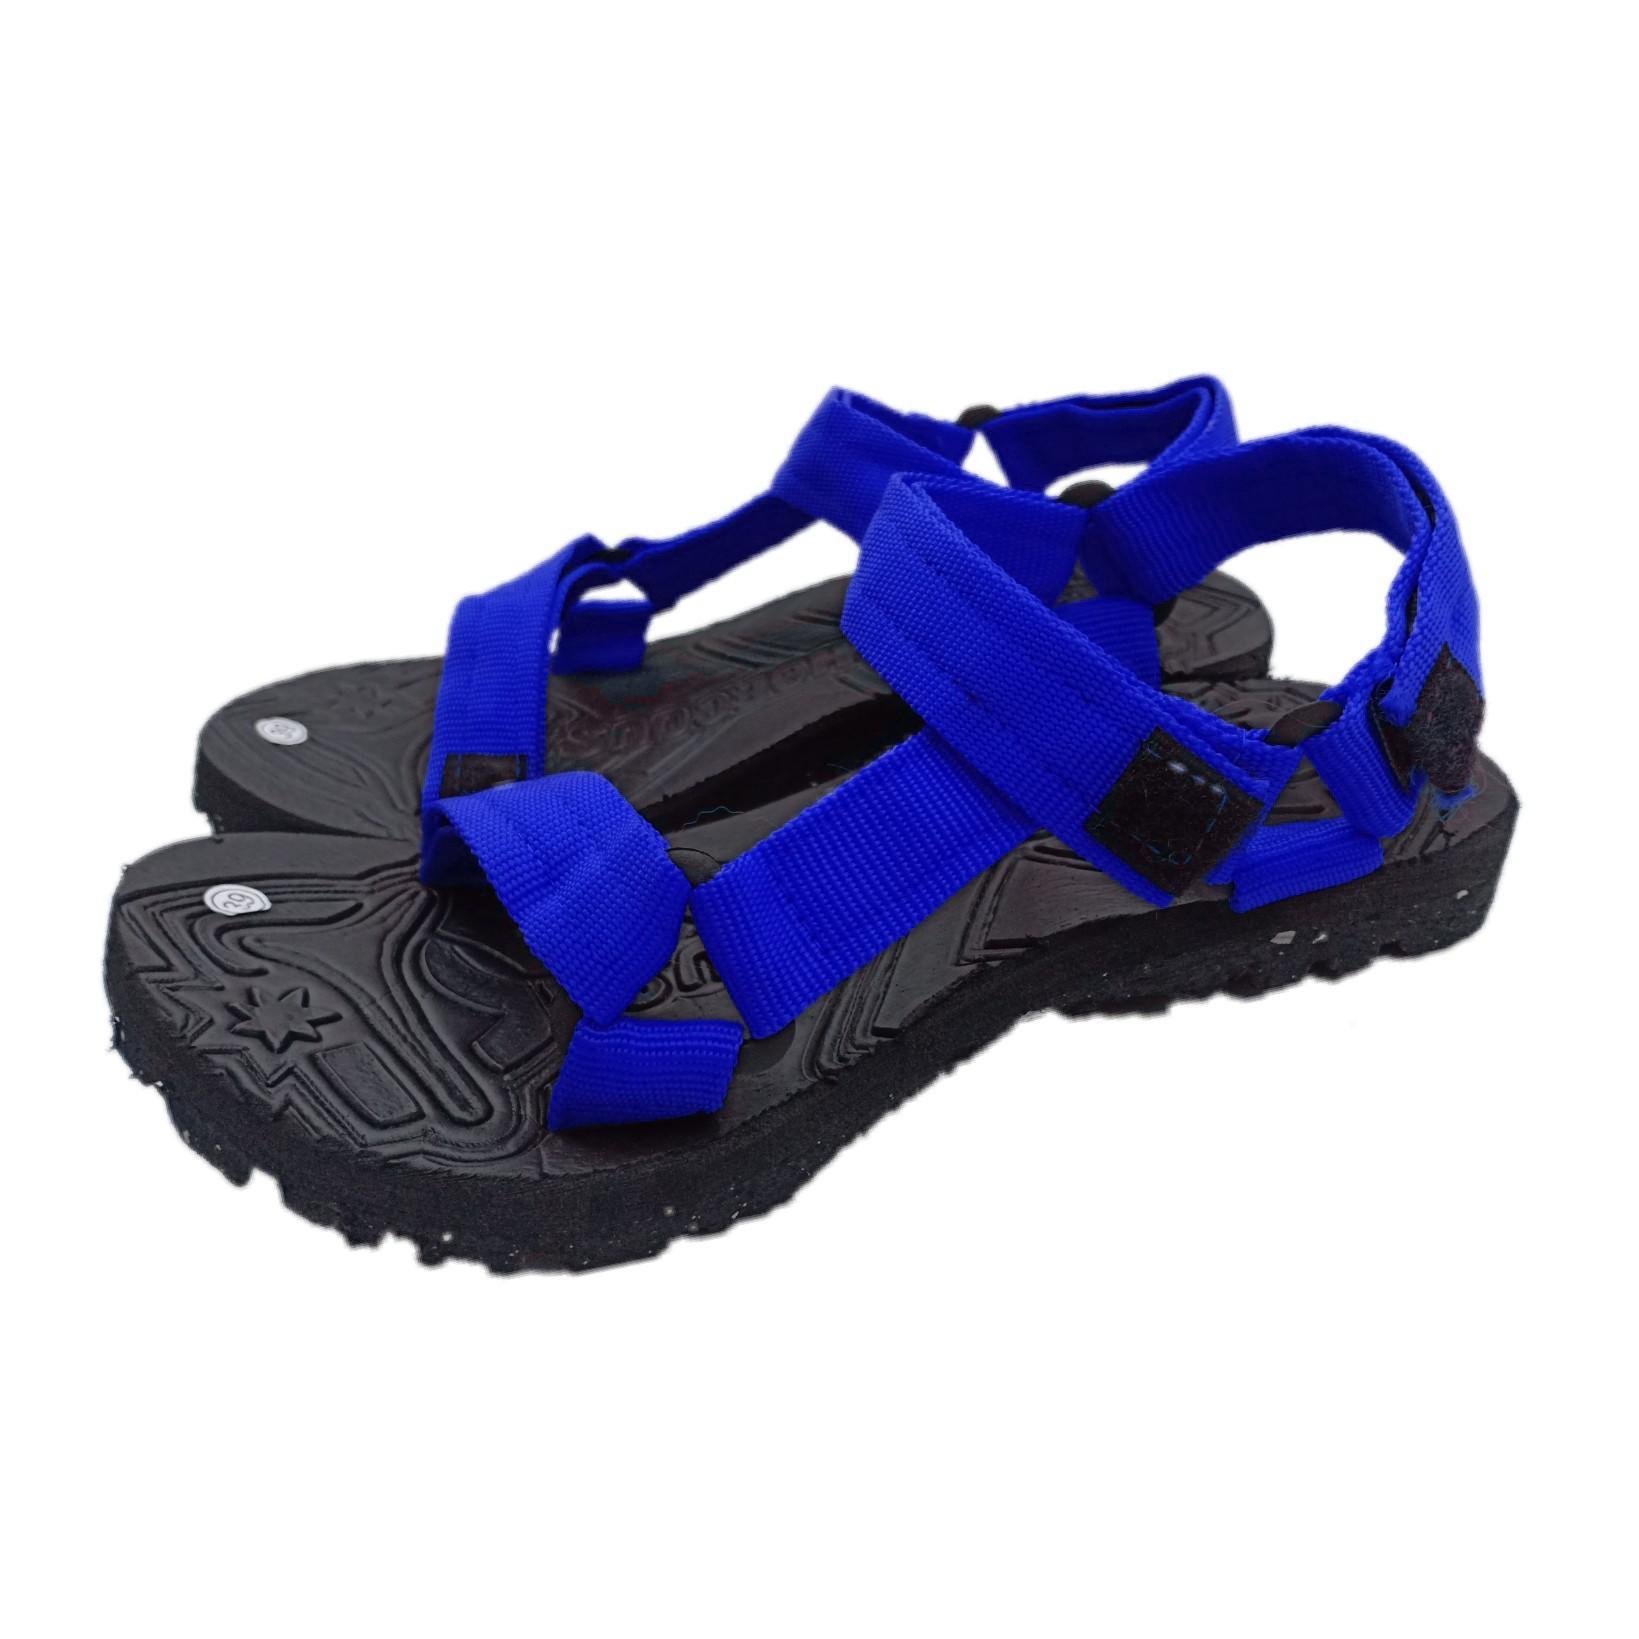 Arsy Sport / Sandal Gunung Pria / Sandal selop / Sandal Pria / Sandal Murah - Biru